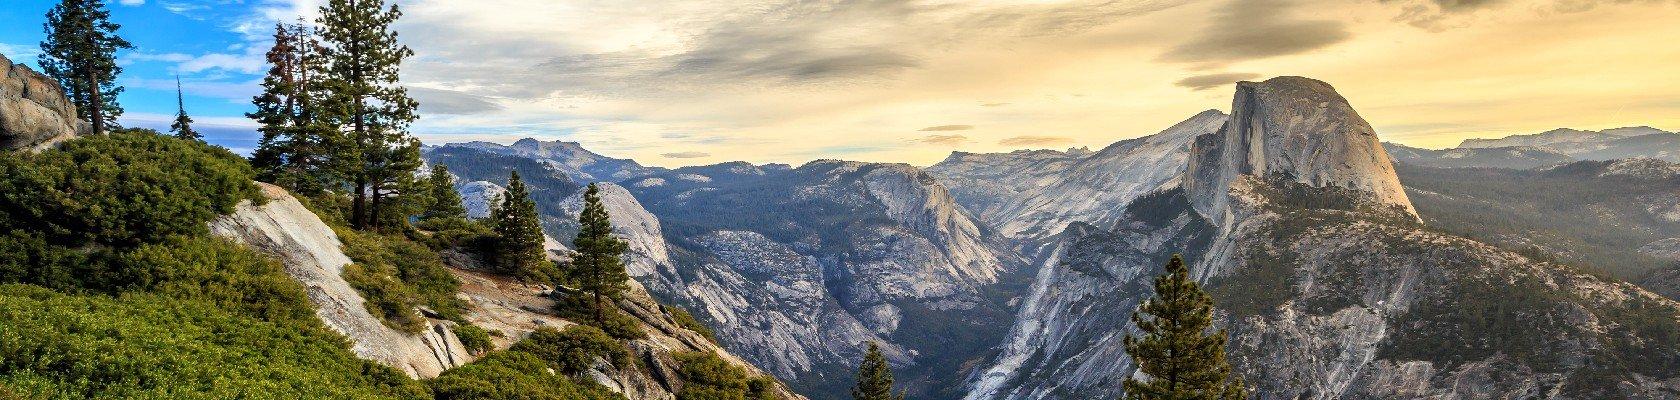 Yosemite Nationaal Park